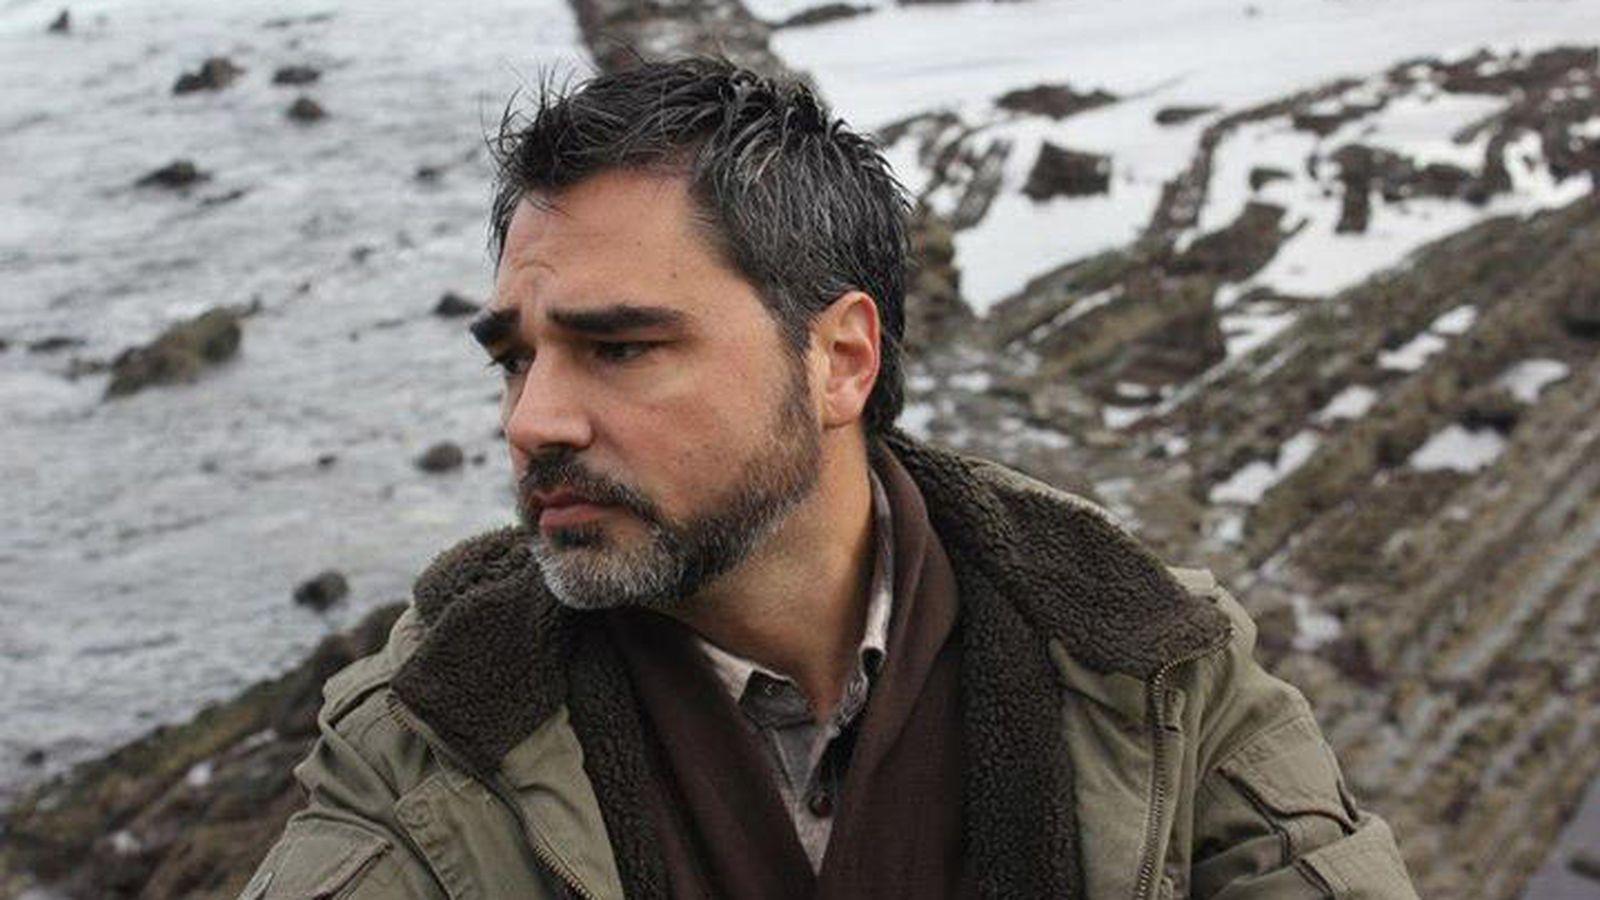 Foto: Imagen de Alejandro de Pedro Llorca de su perfil de Facebook.